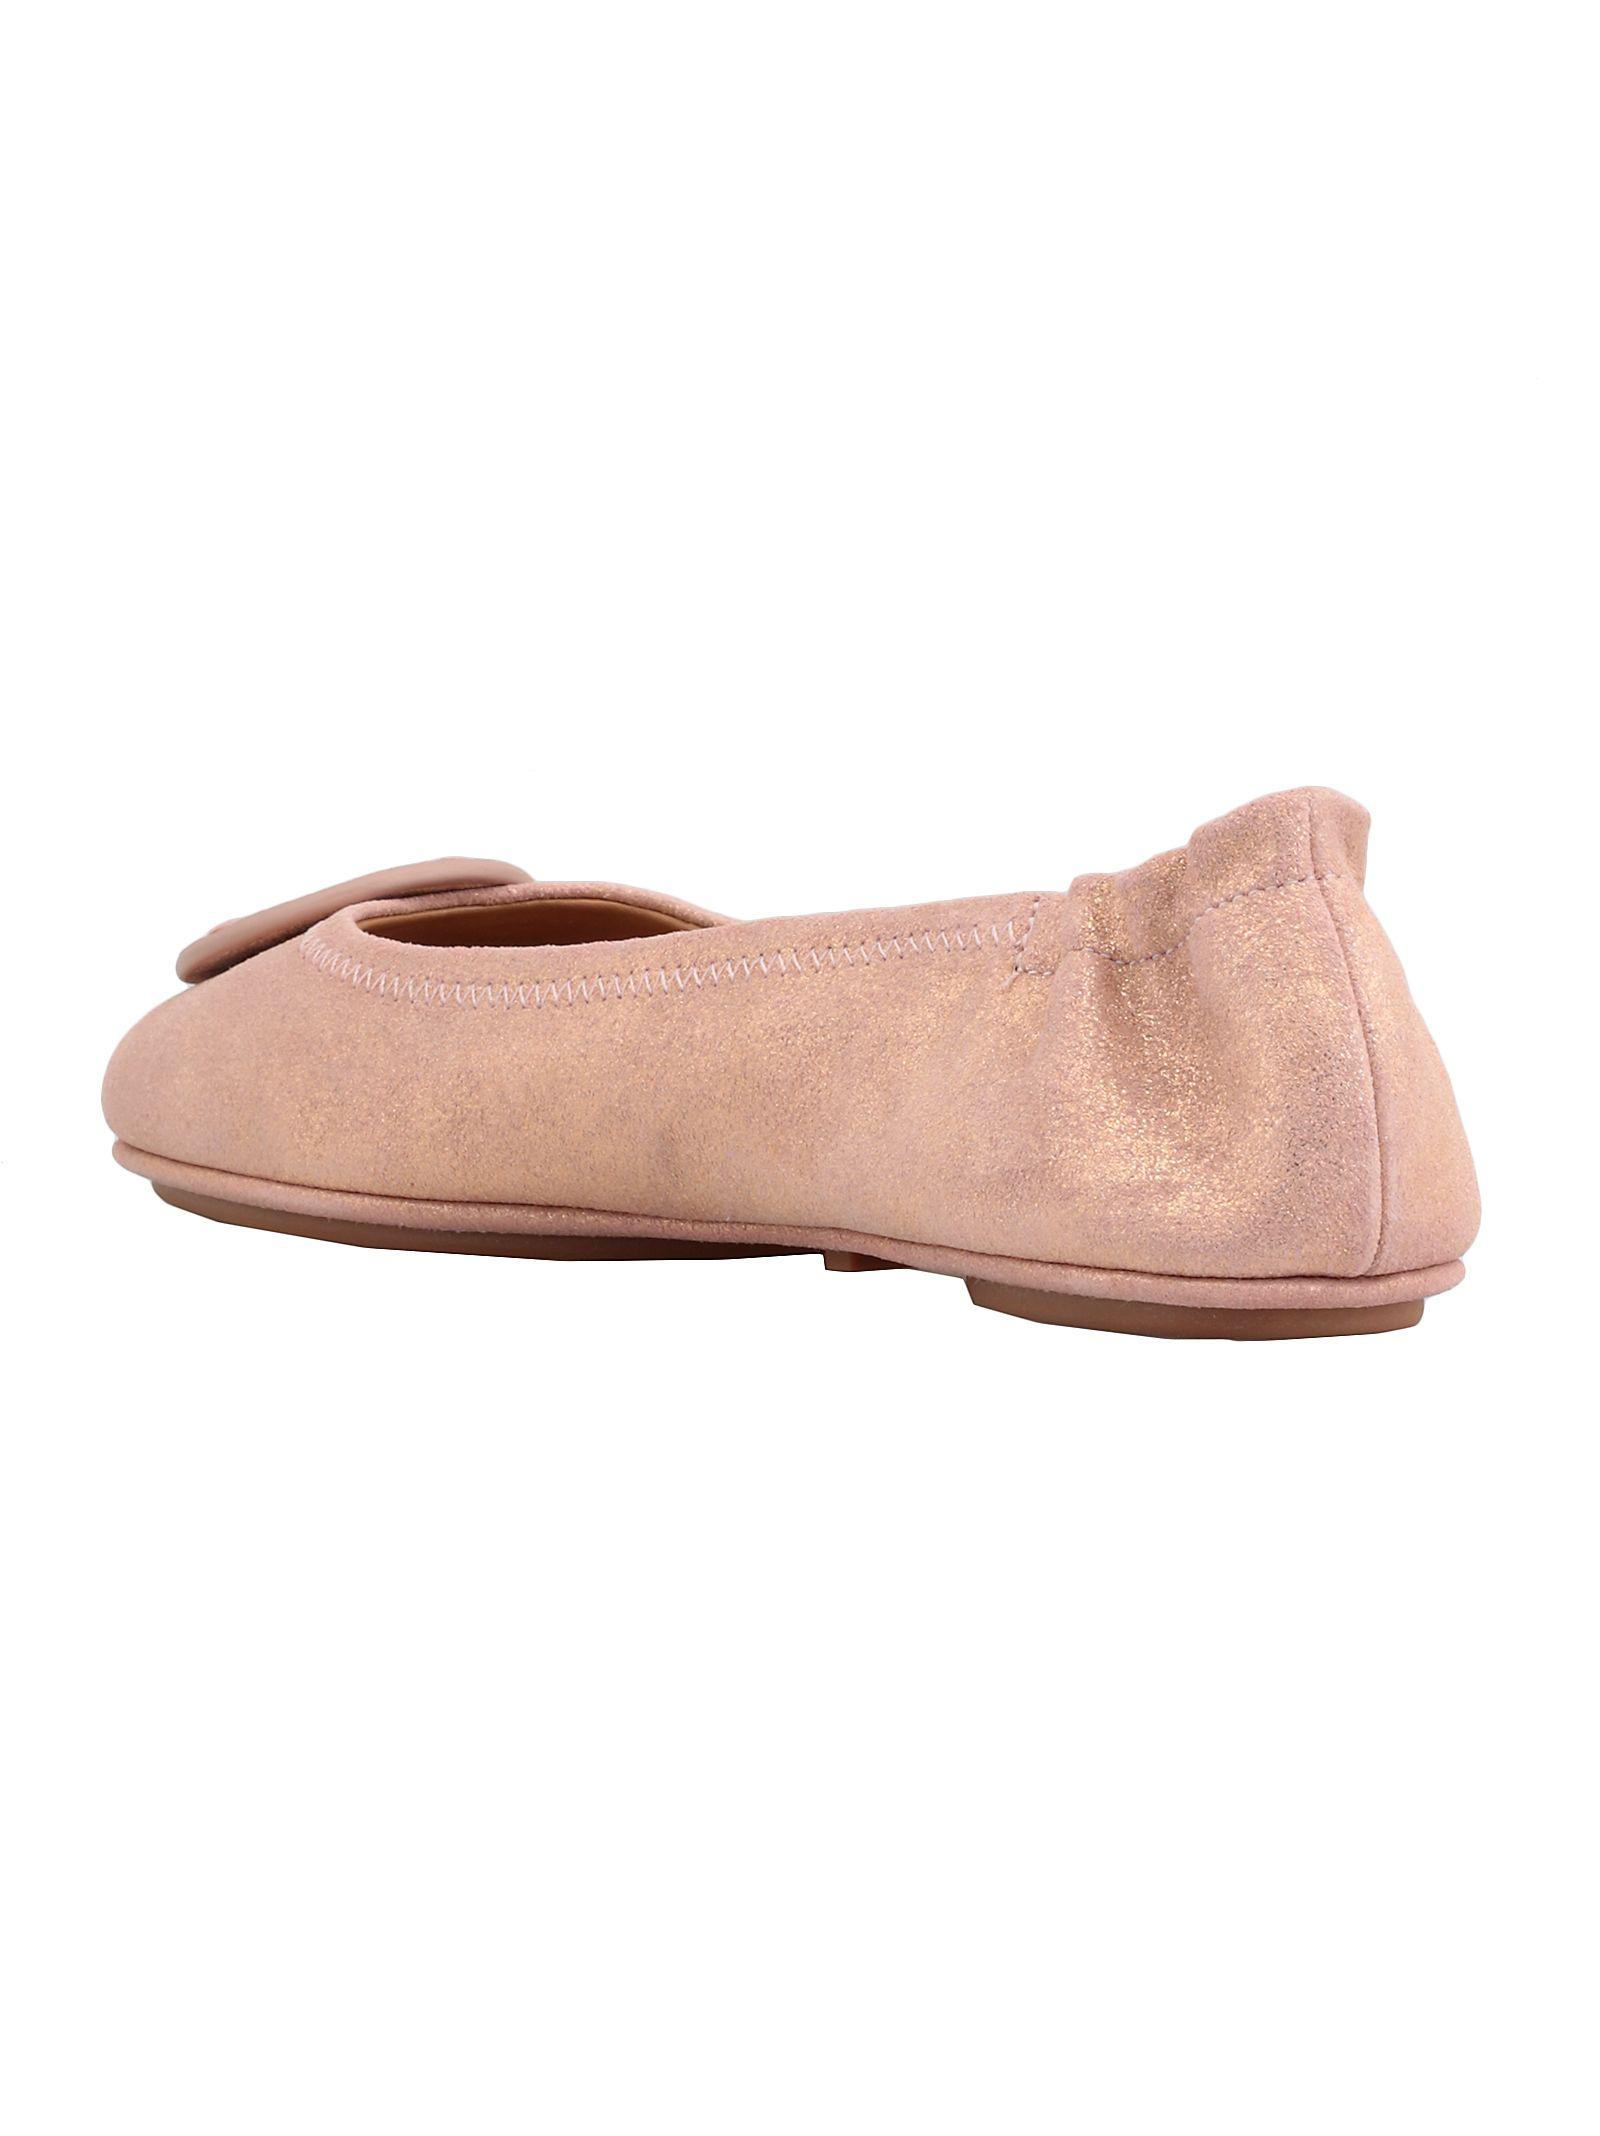 f57cca26f389 Tory Burch Tory Burch Minnie Travel Ballet - METALLIC SEA SHELL PINK ...